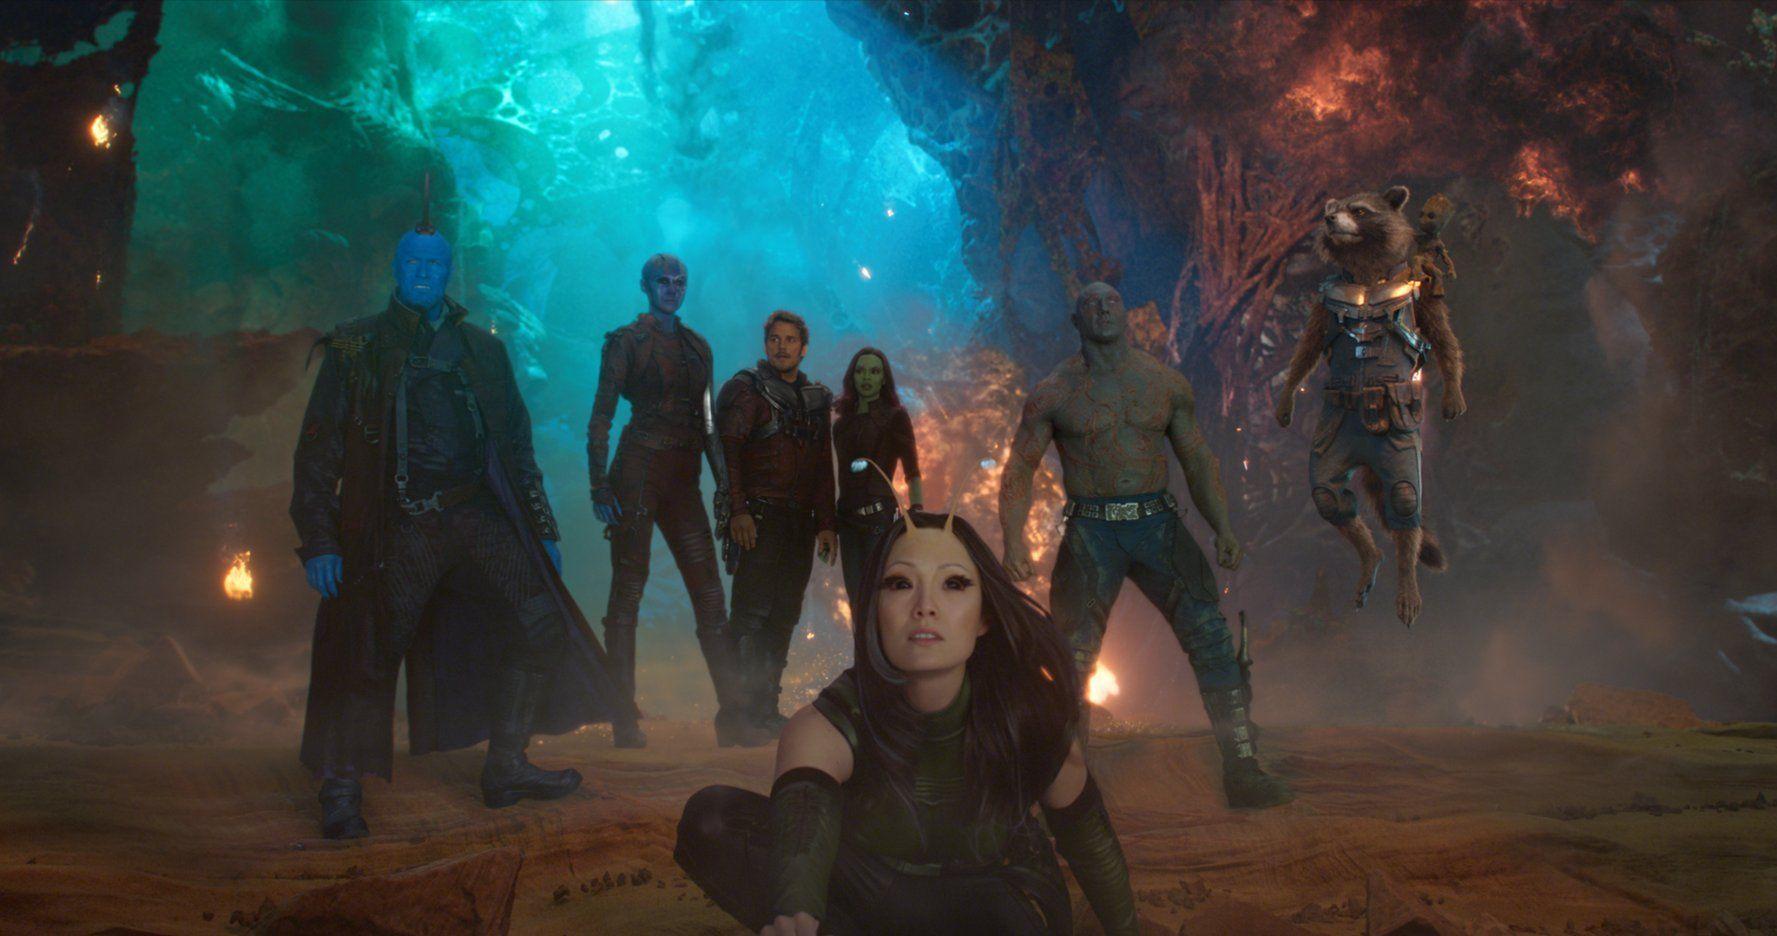 Best of 2017: Our Favorite Movie Stills   Guardians of the galaxy vol 2, Guardians of the galaxy, Marvel cinematic